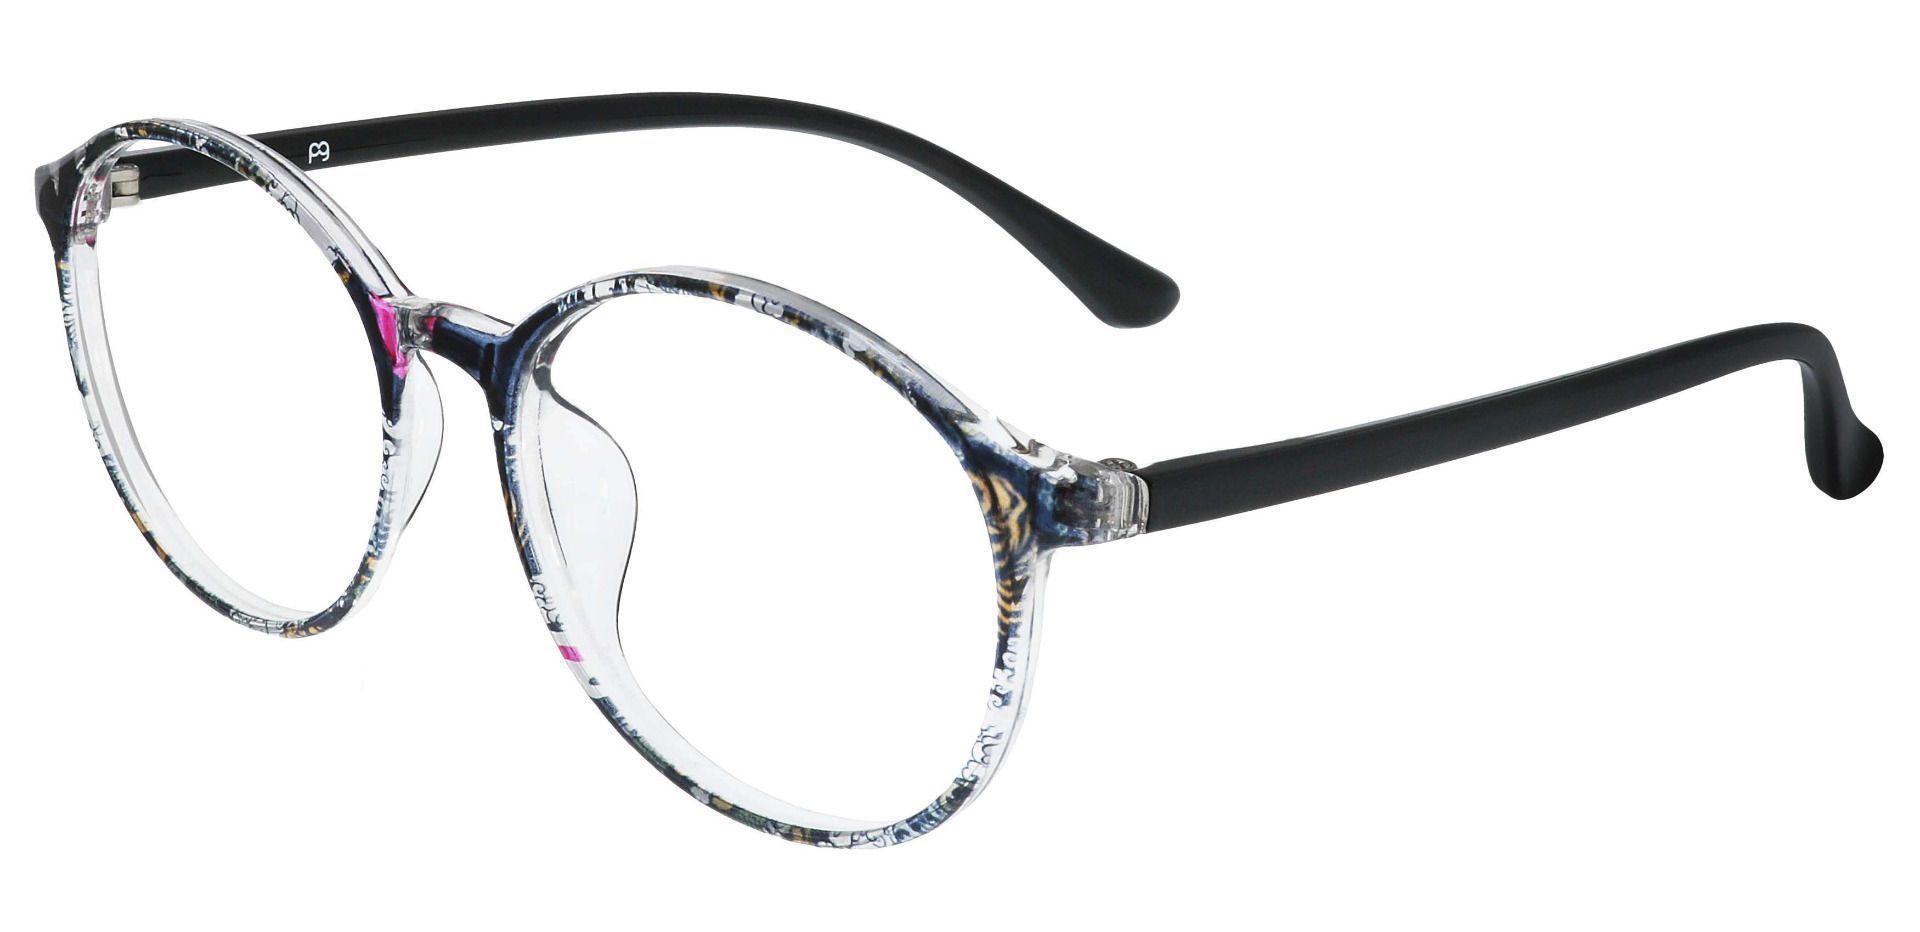 Zemi Round Prescription Glasses - Floral